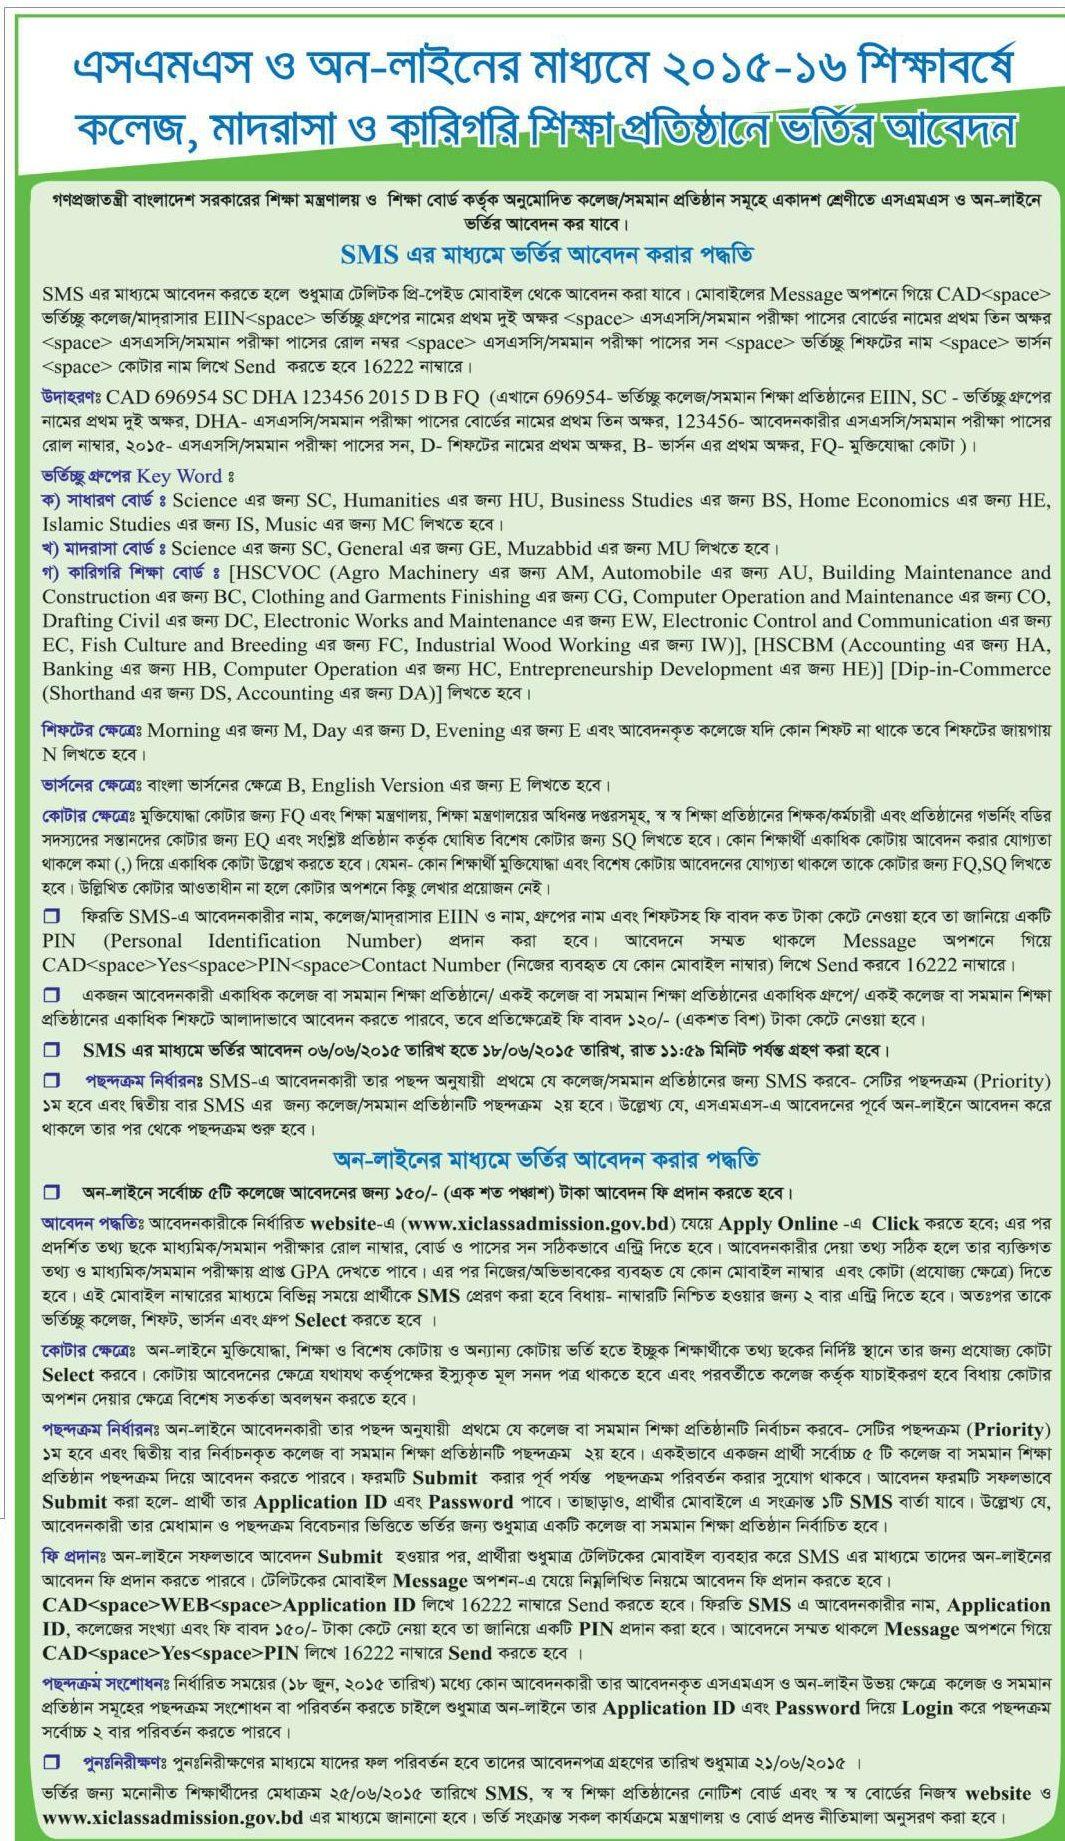 HSC admission 2015